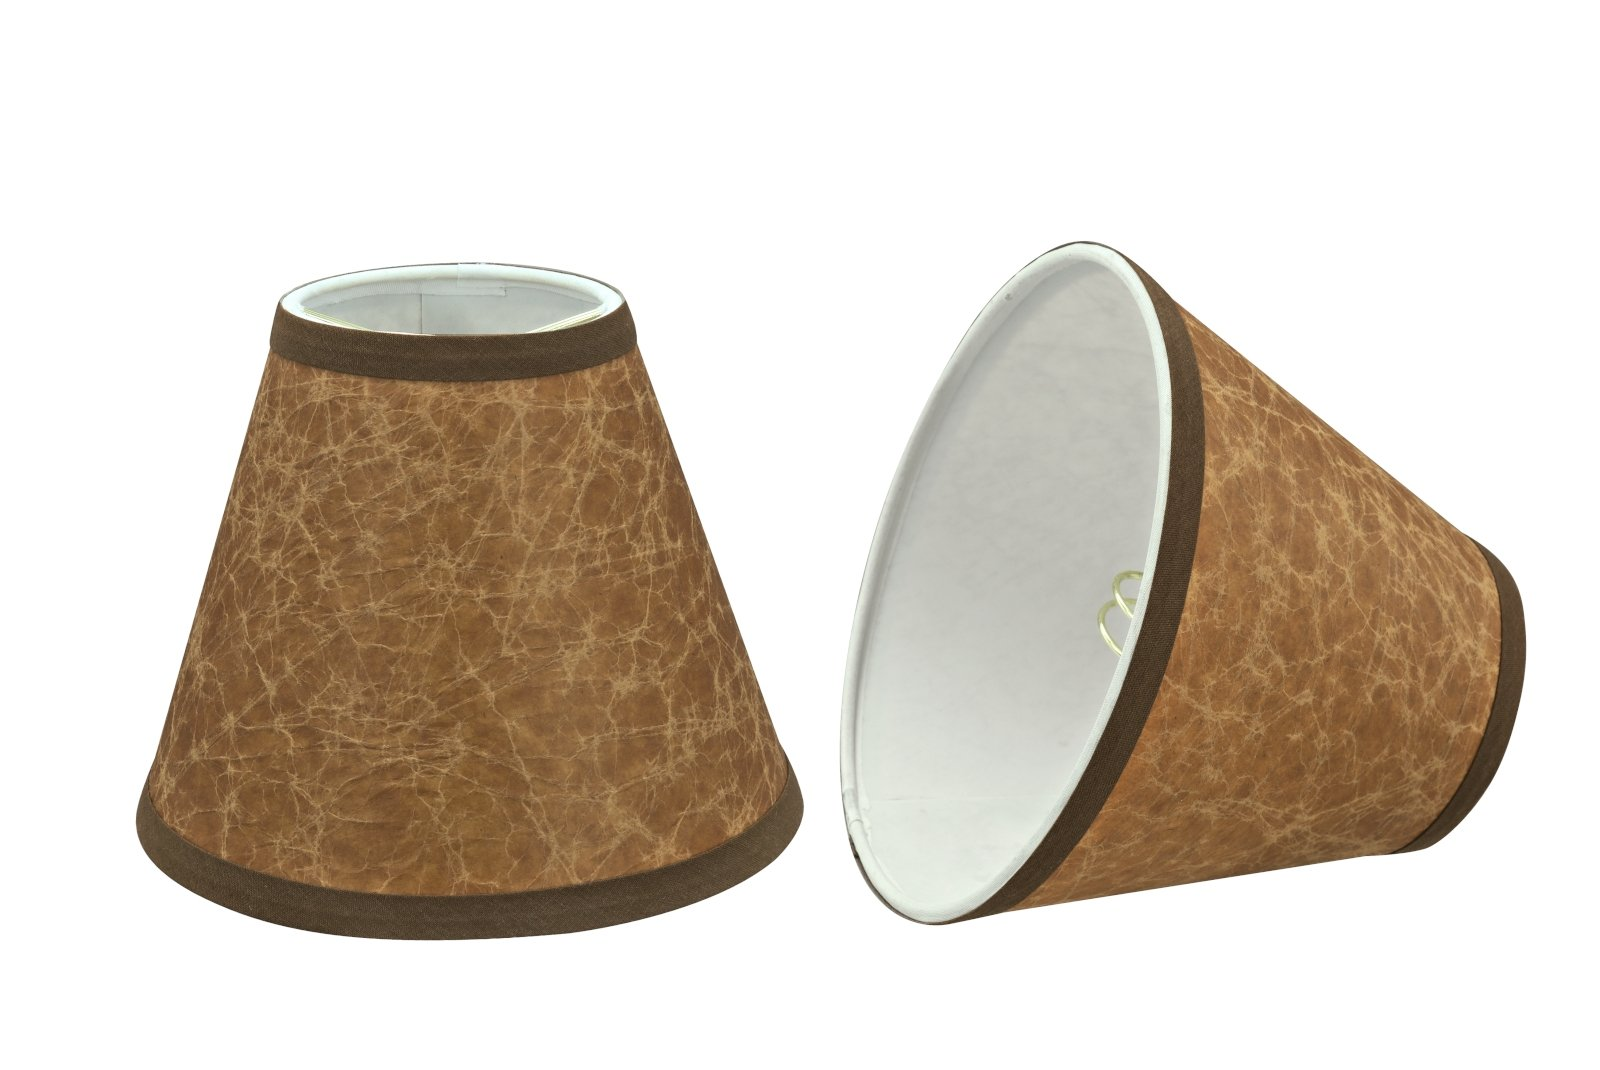 Aspen Creative 32117-2 Small Hardback Empire Shape Chandelier Clip-on Lamp Shade Set (2 Pack), 3'' x 6'' x 5'', Dark Brown